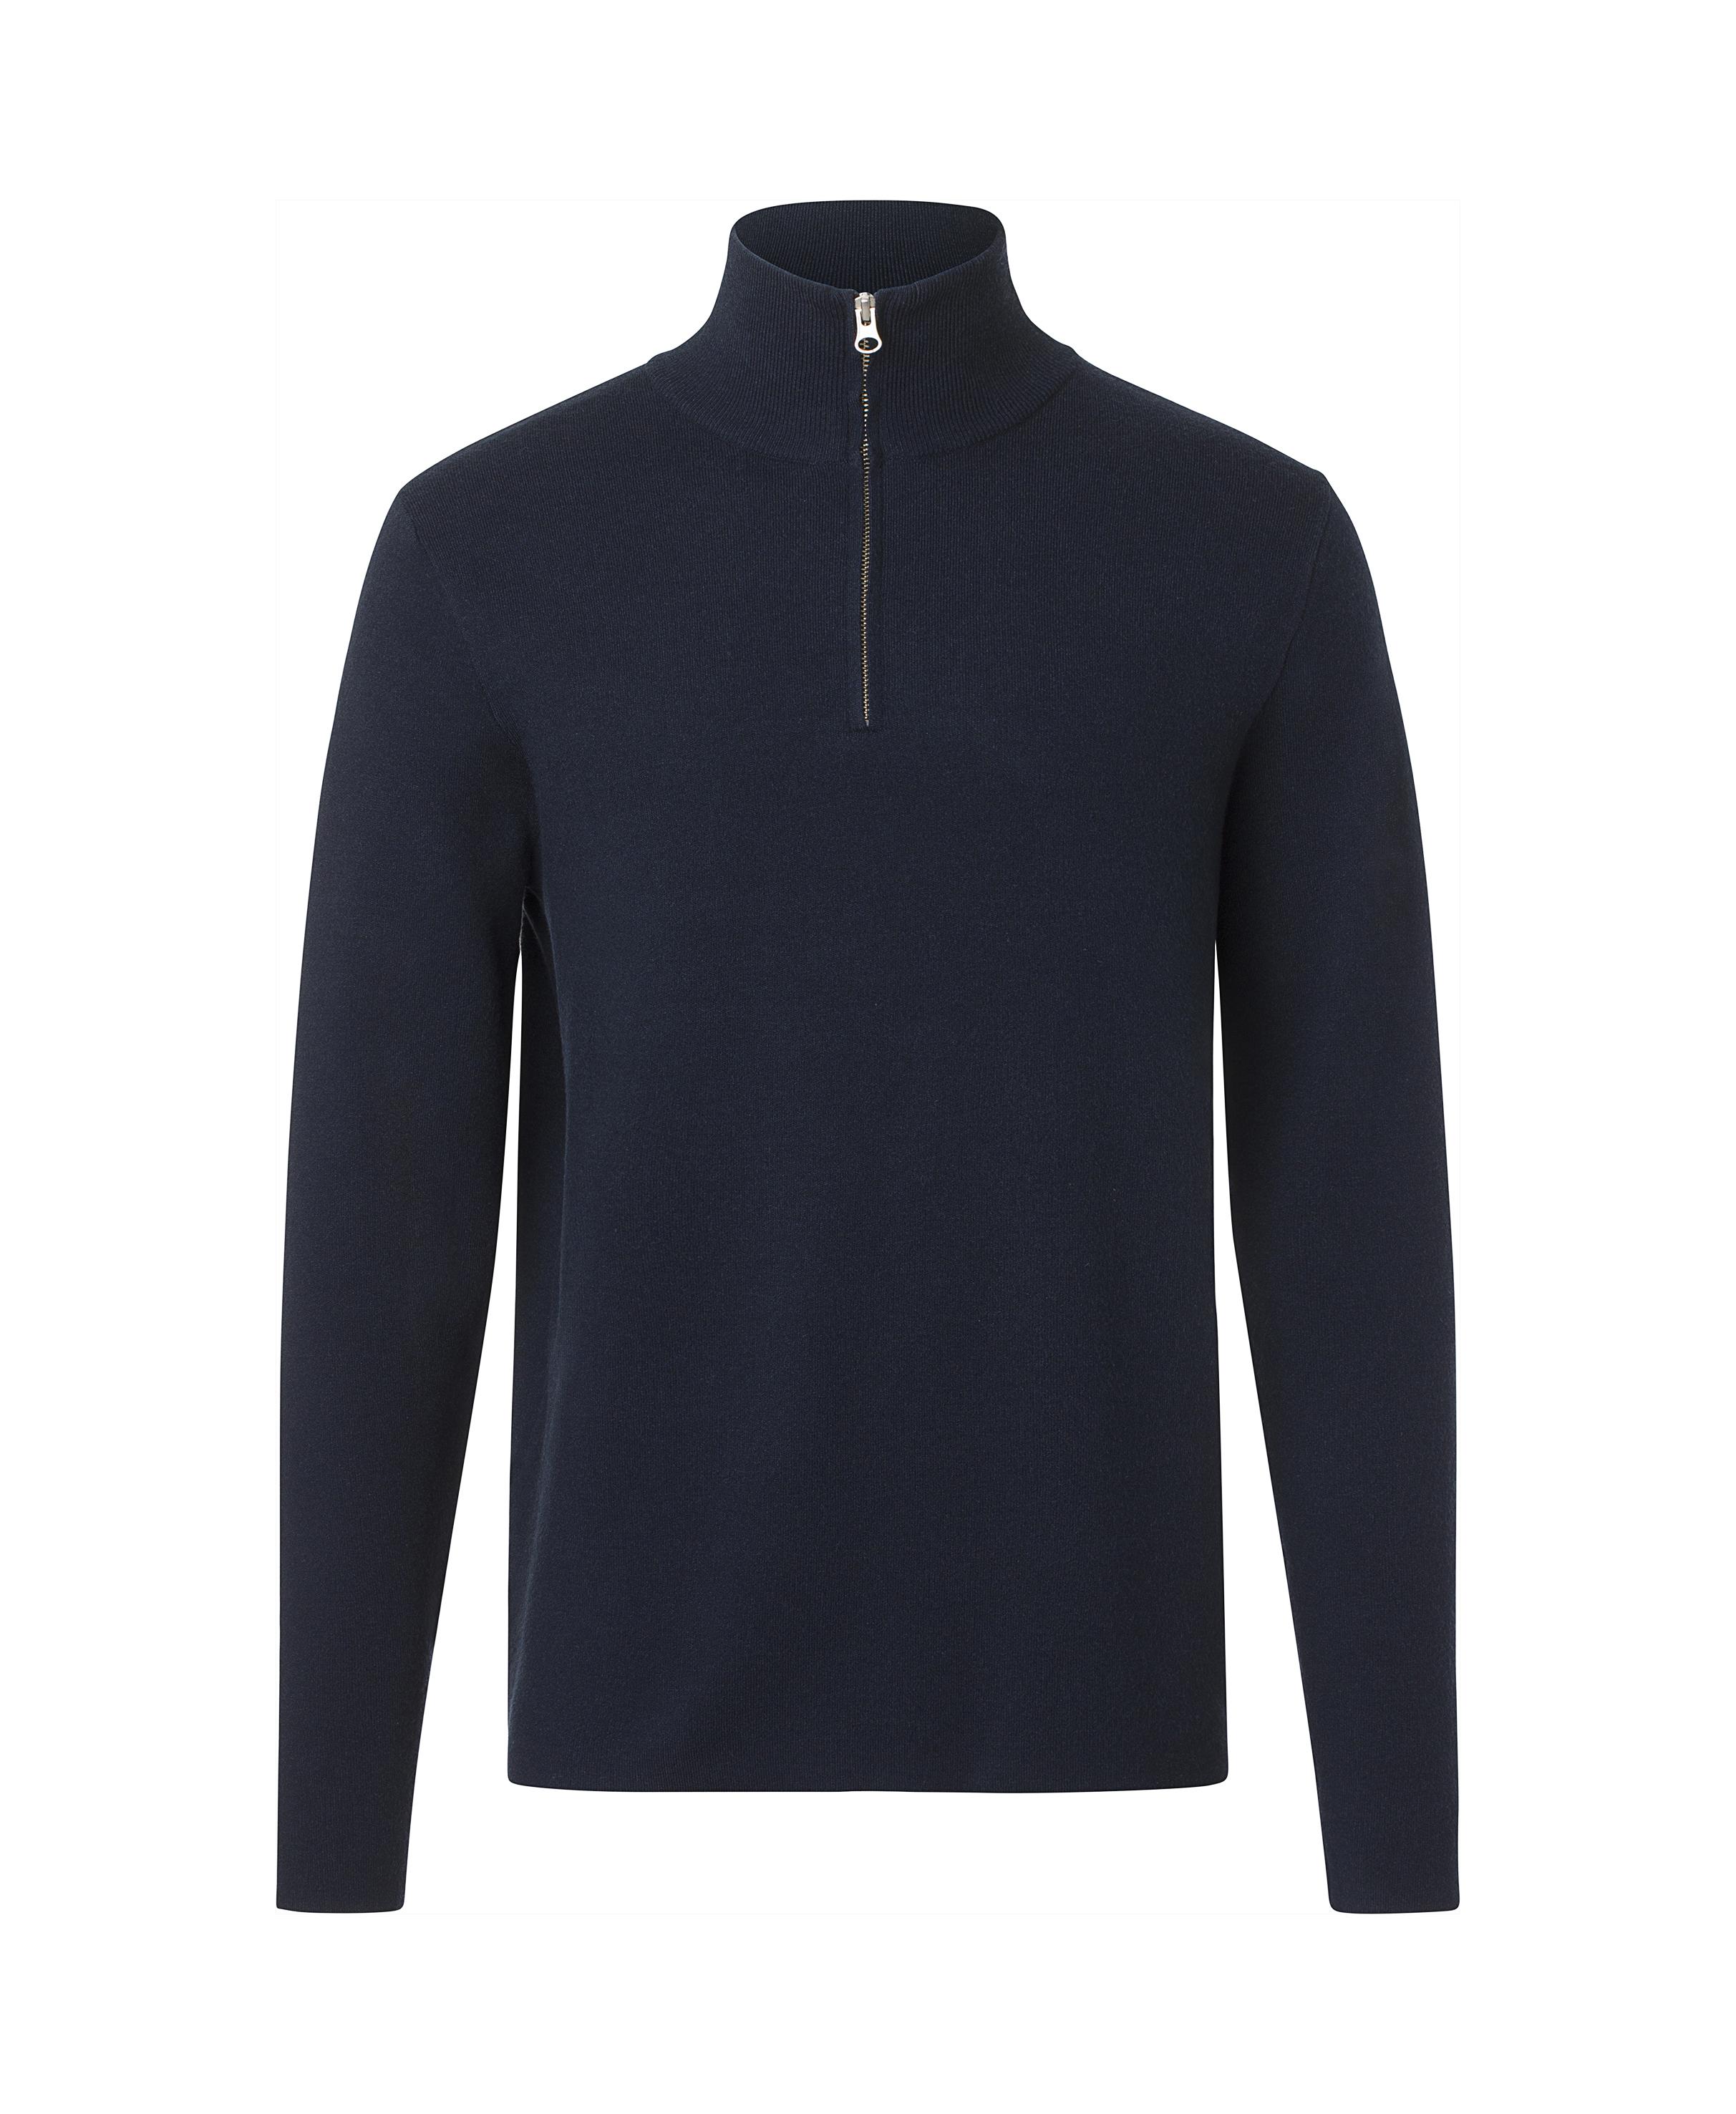 Samsøe & Samsøe Gunan Zip Sweater